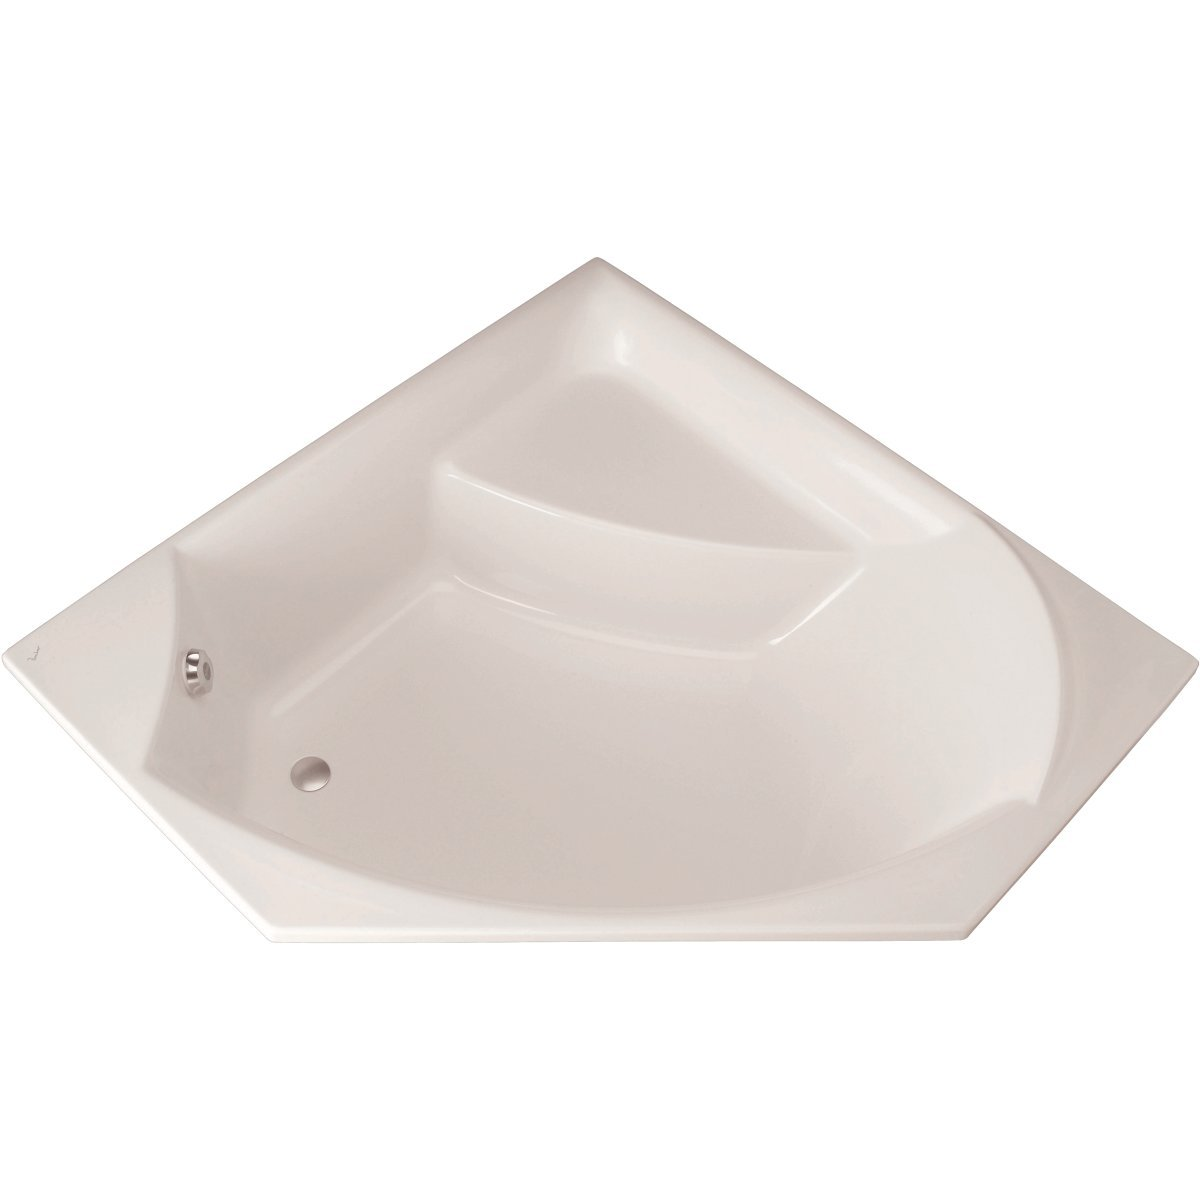 Baignoire kheops2 140 blanc ideal standard grenoble for Longueur standard baignoire